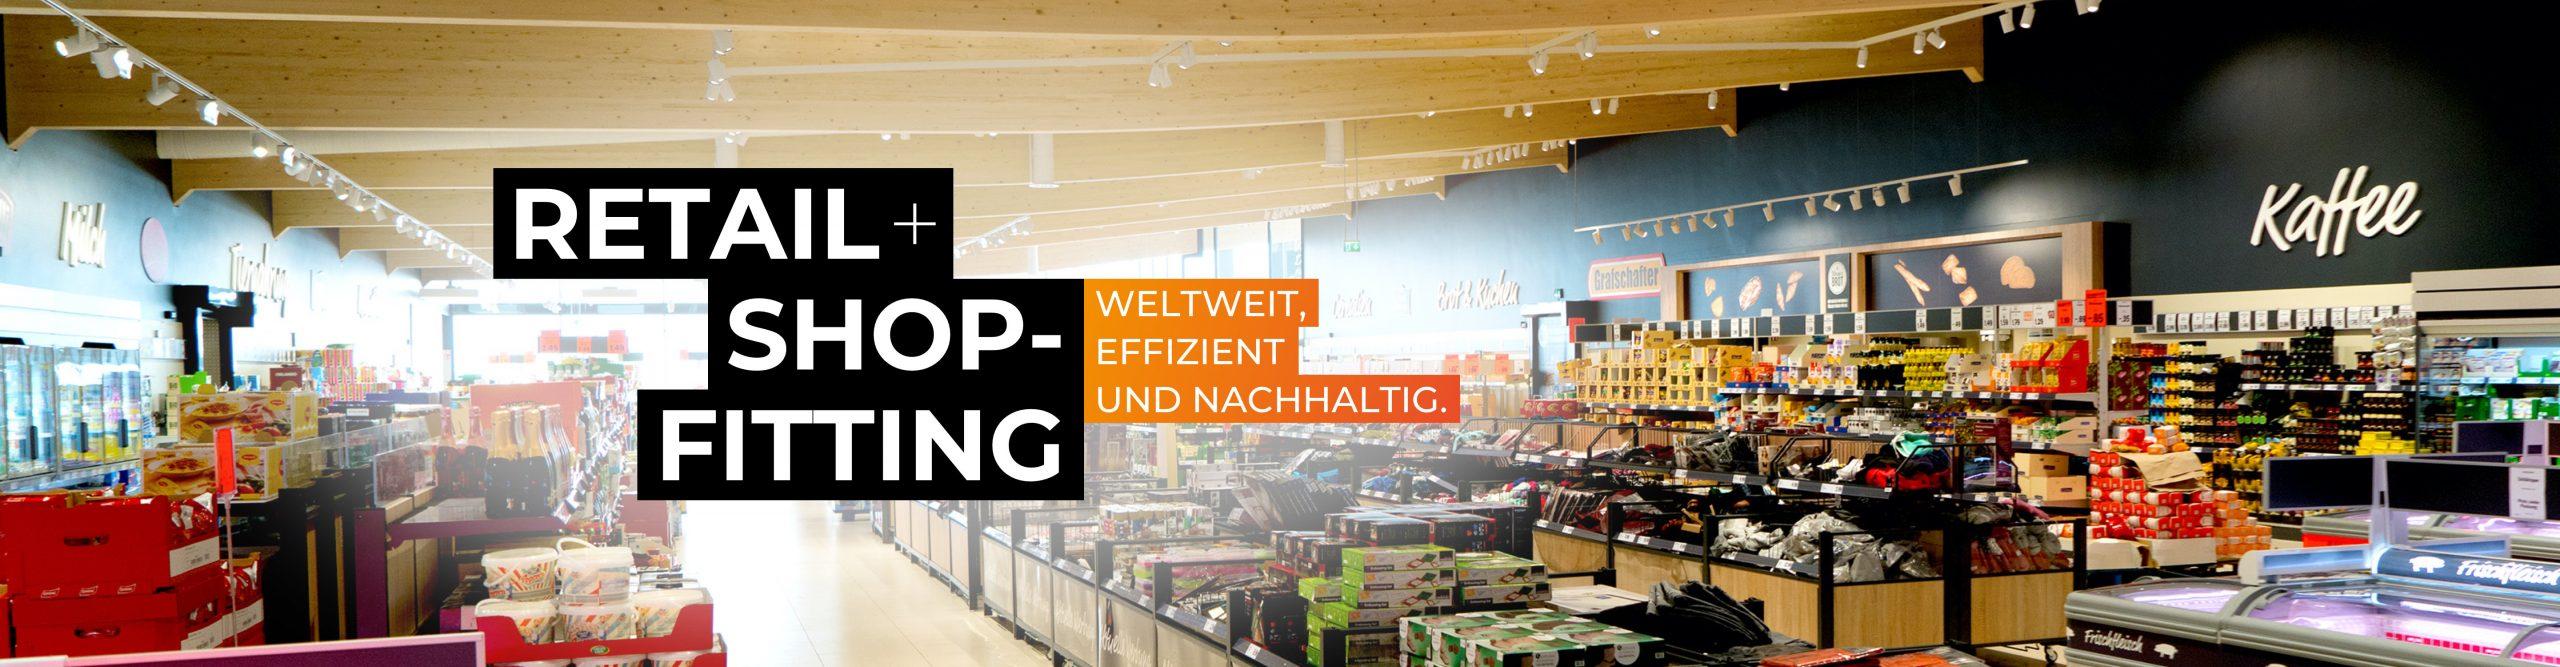 Shopausstattung Retail Header